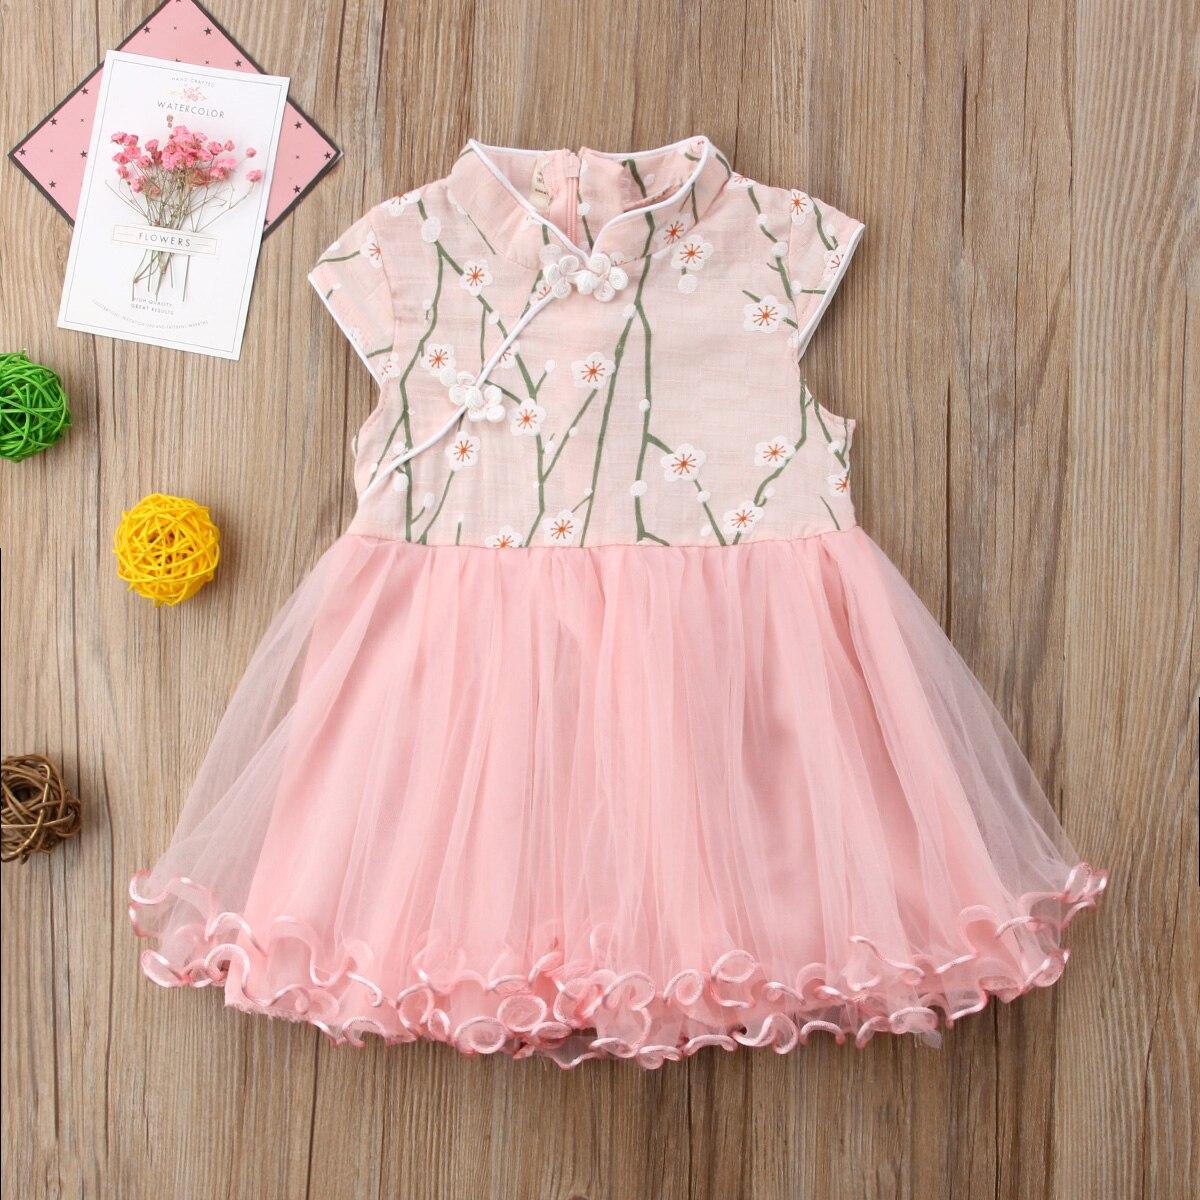 Lucu Putri Anak Gaun Pesta Bayi perempuan Gaya Cina Bunga Ulang Tahun  Pernikahan Pakaian Pengiring Pengantin Tanpa Lengan Musim Panas Tutu Gaun  di Dresses ... 9ff973d8fa